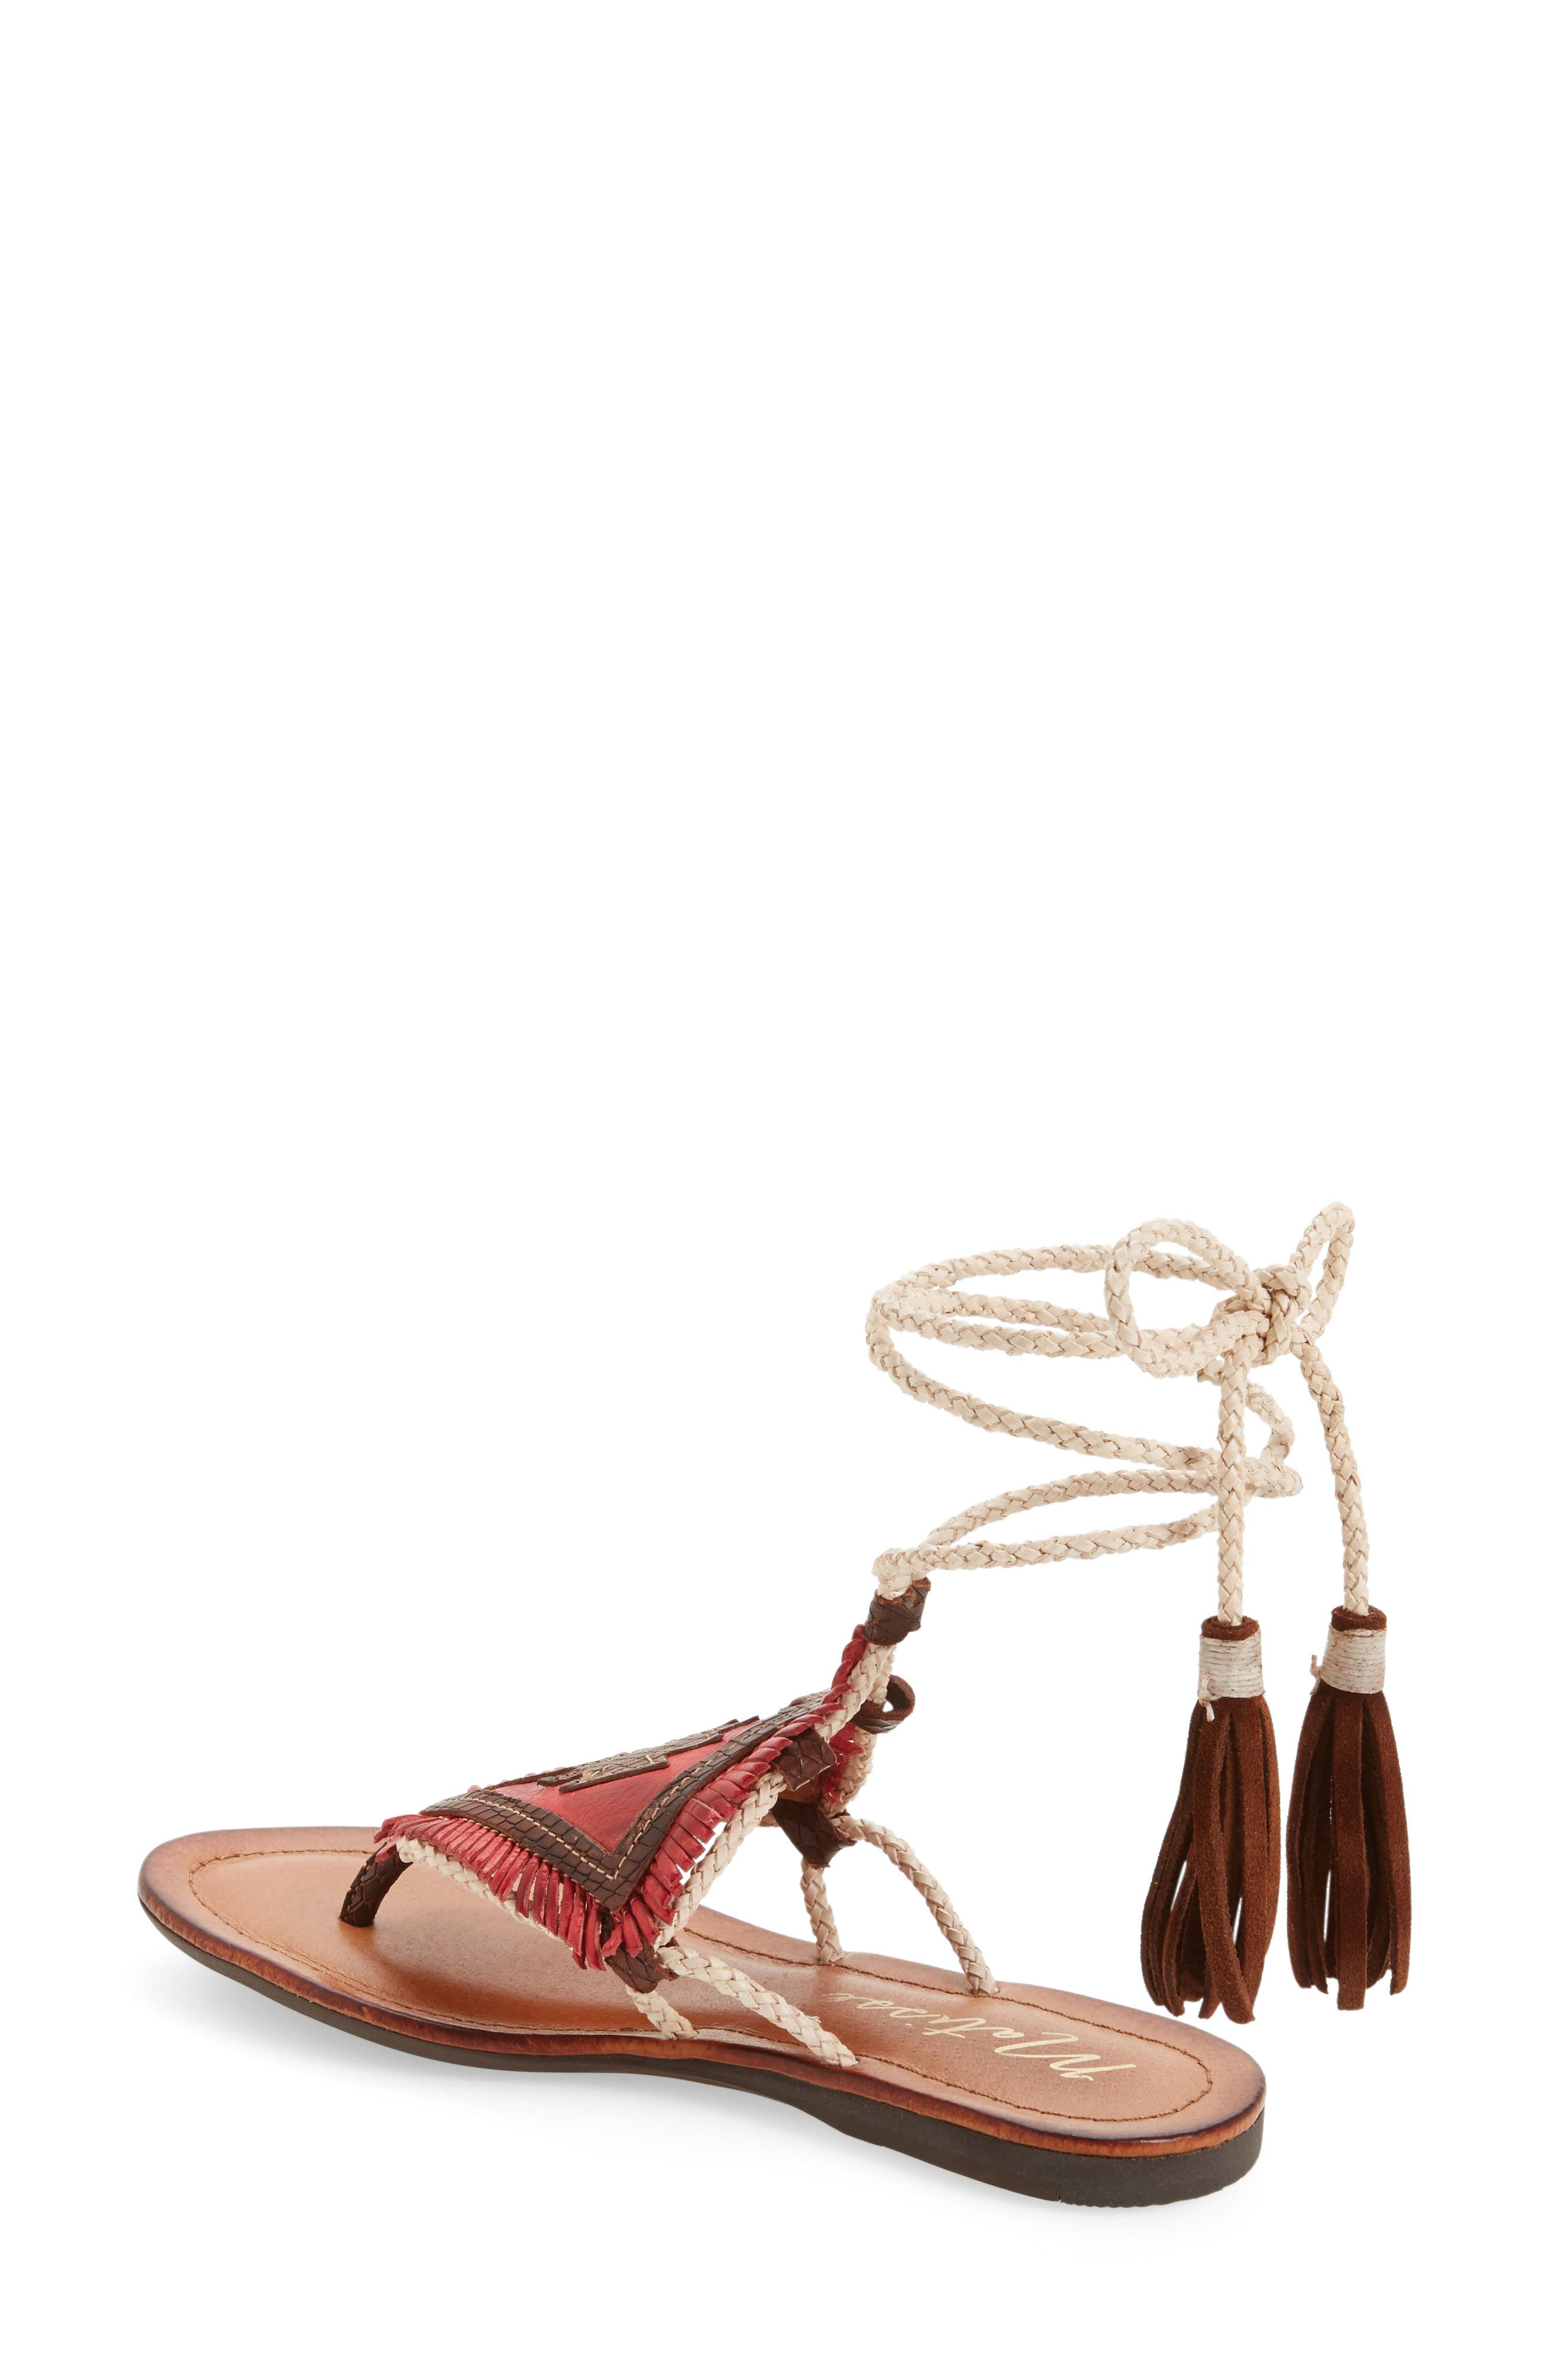 Bronte Tassel Lace-Up Sandal,                             Alternate thumbnail 4, color,